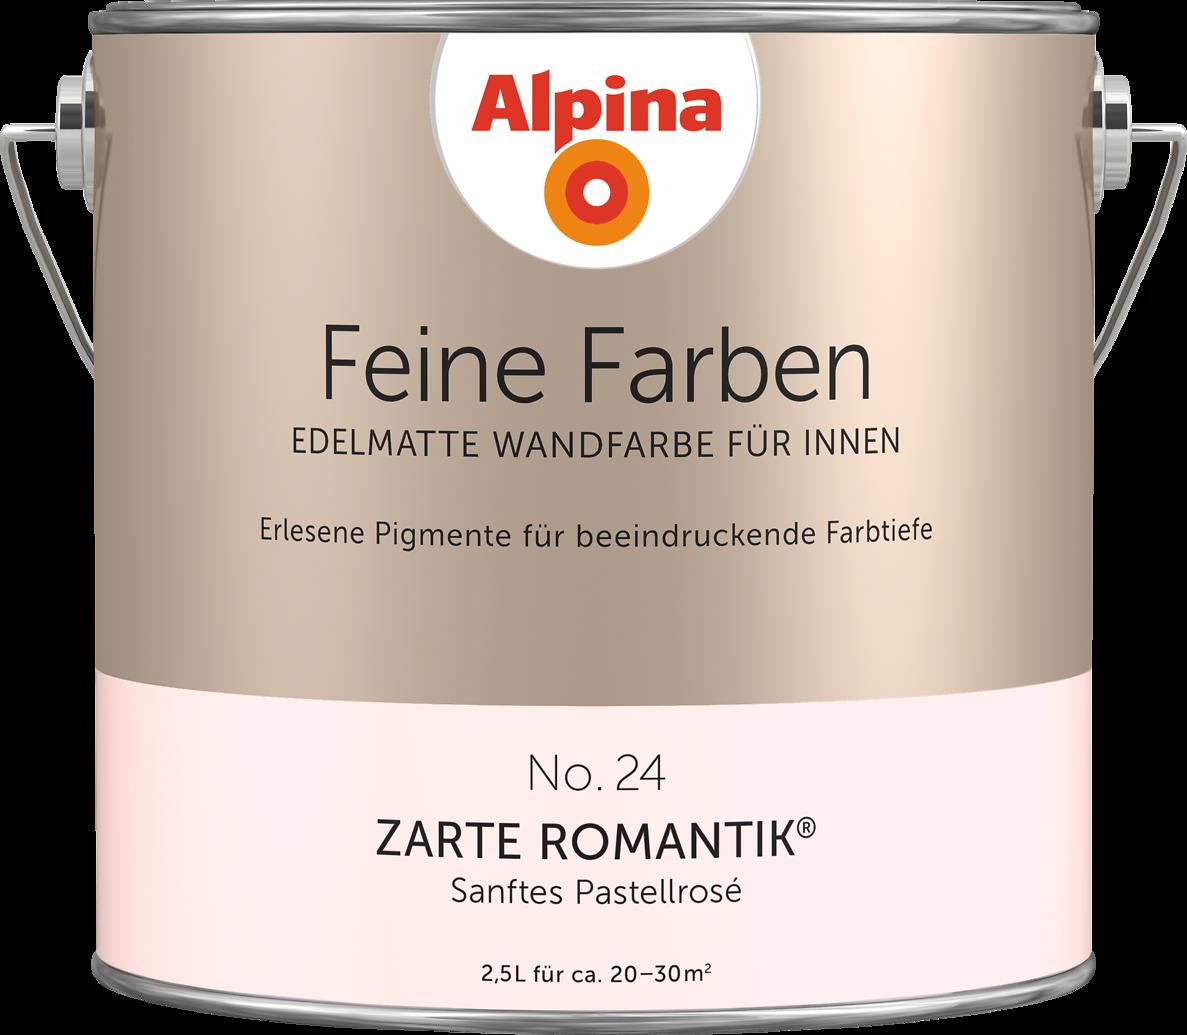 Alpina Feine Farben Nr. 24 U201eZARTE ROMANTIKu201c   Sanftes Pastellrosé